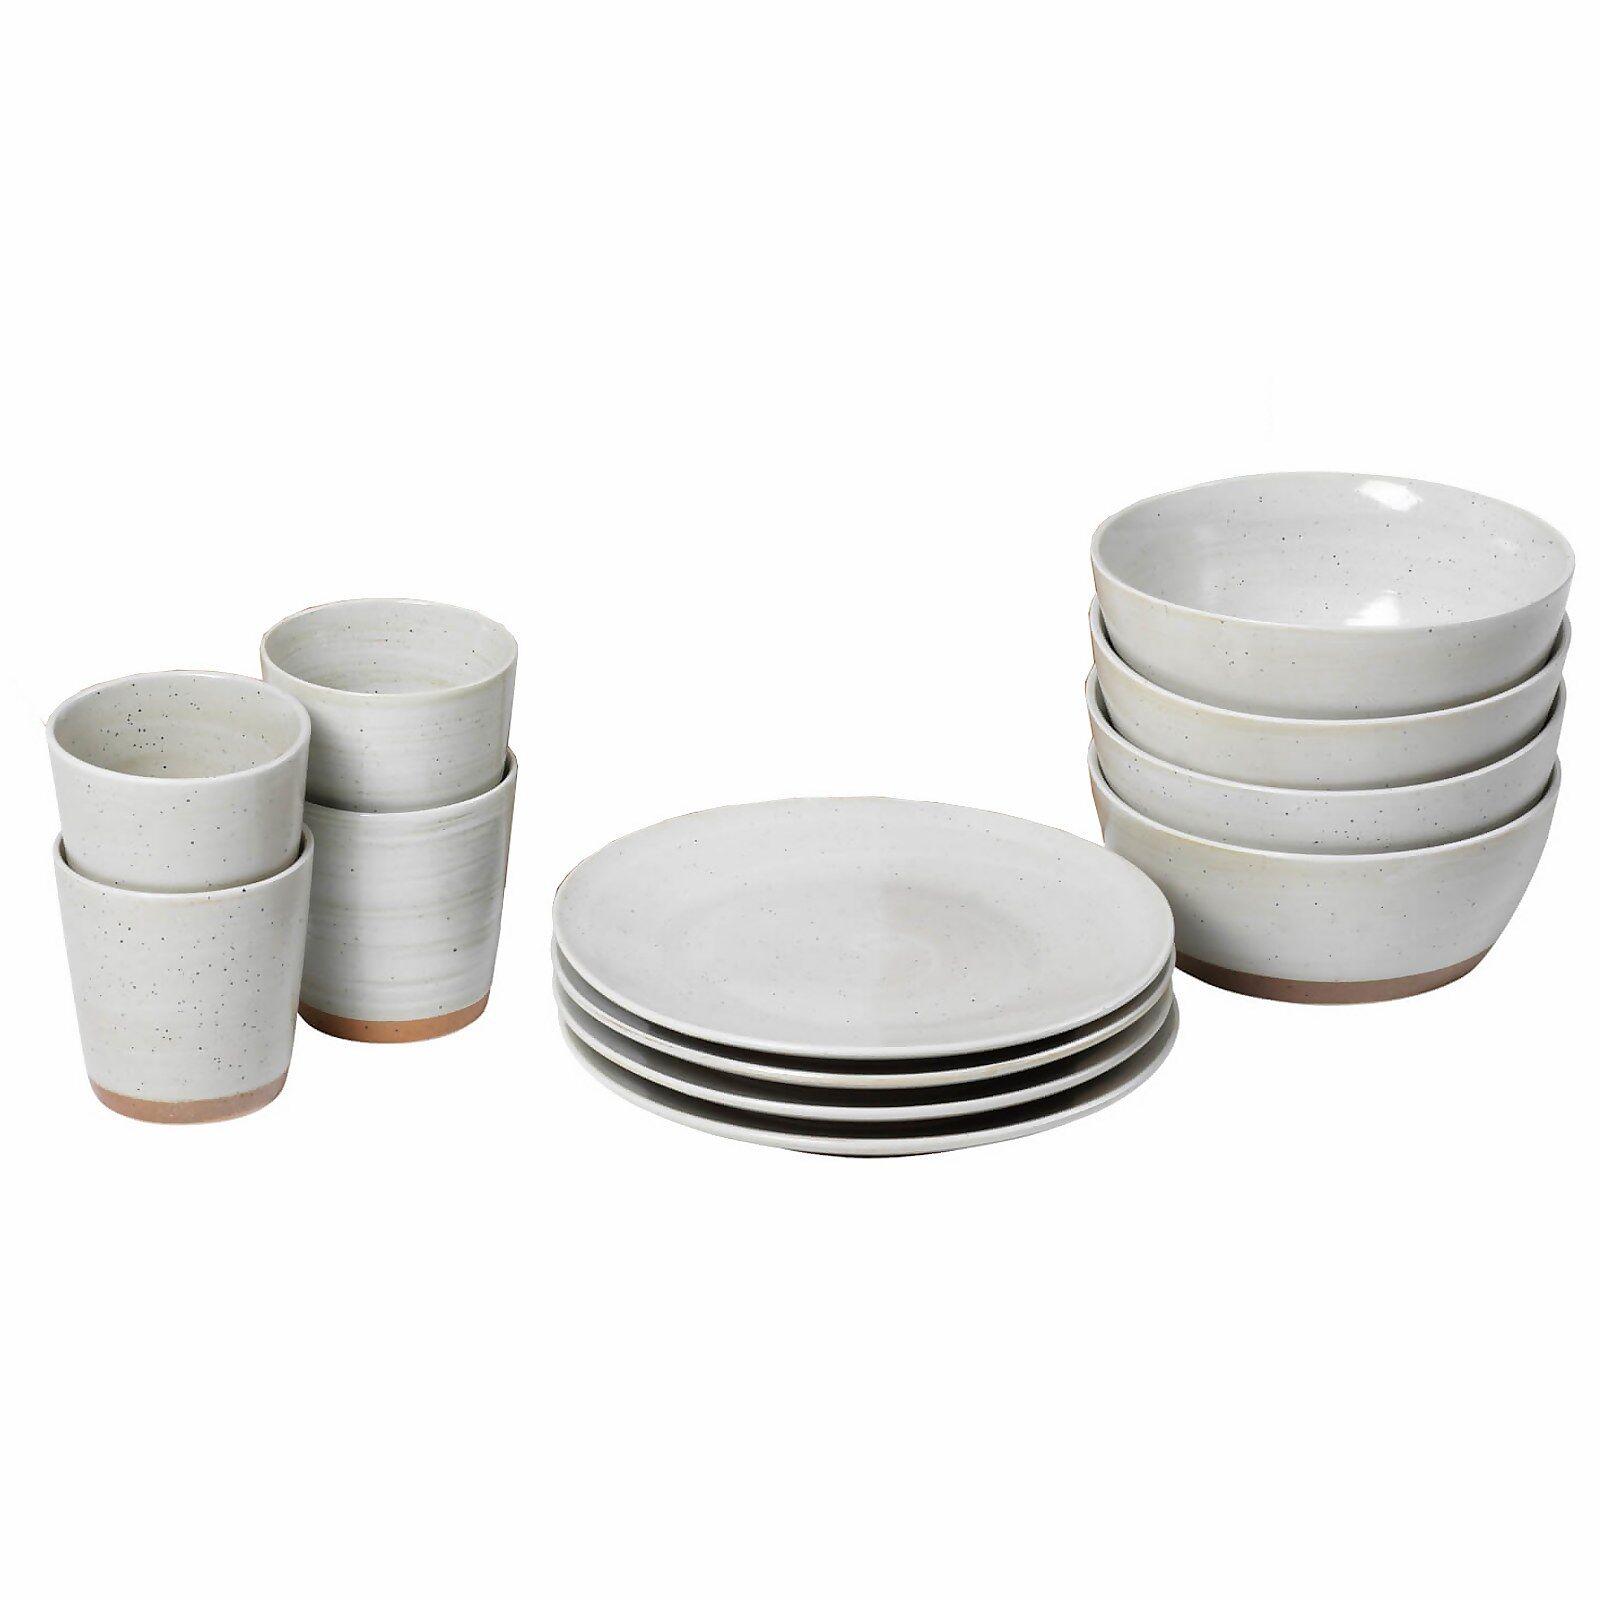 Broste Copenhagen Grod Stoneware Table Set - Sand